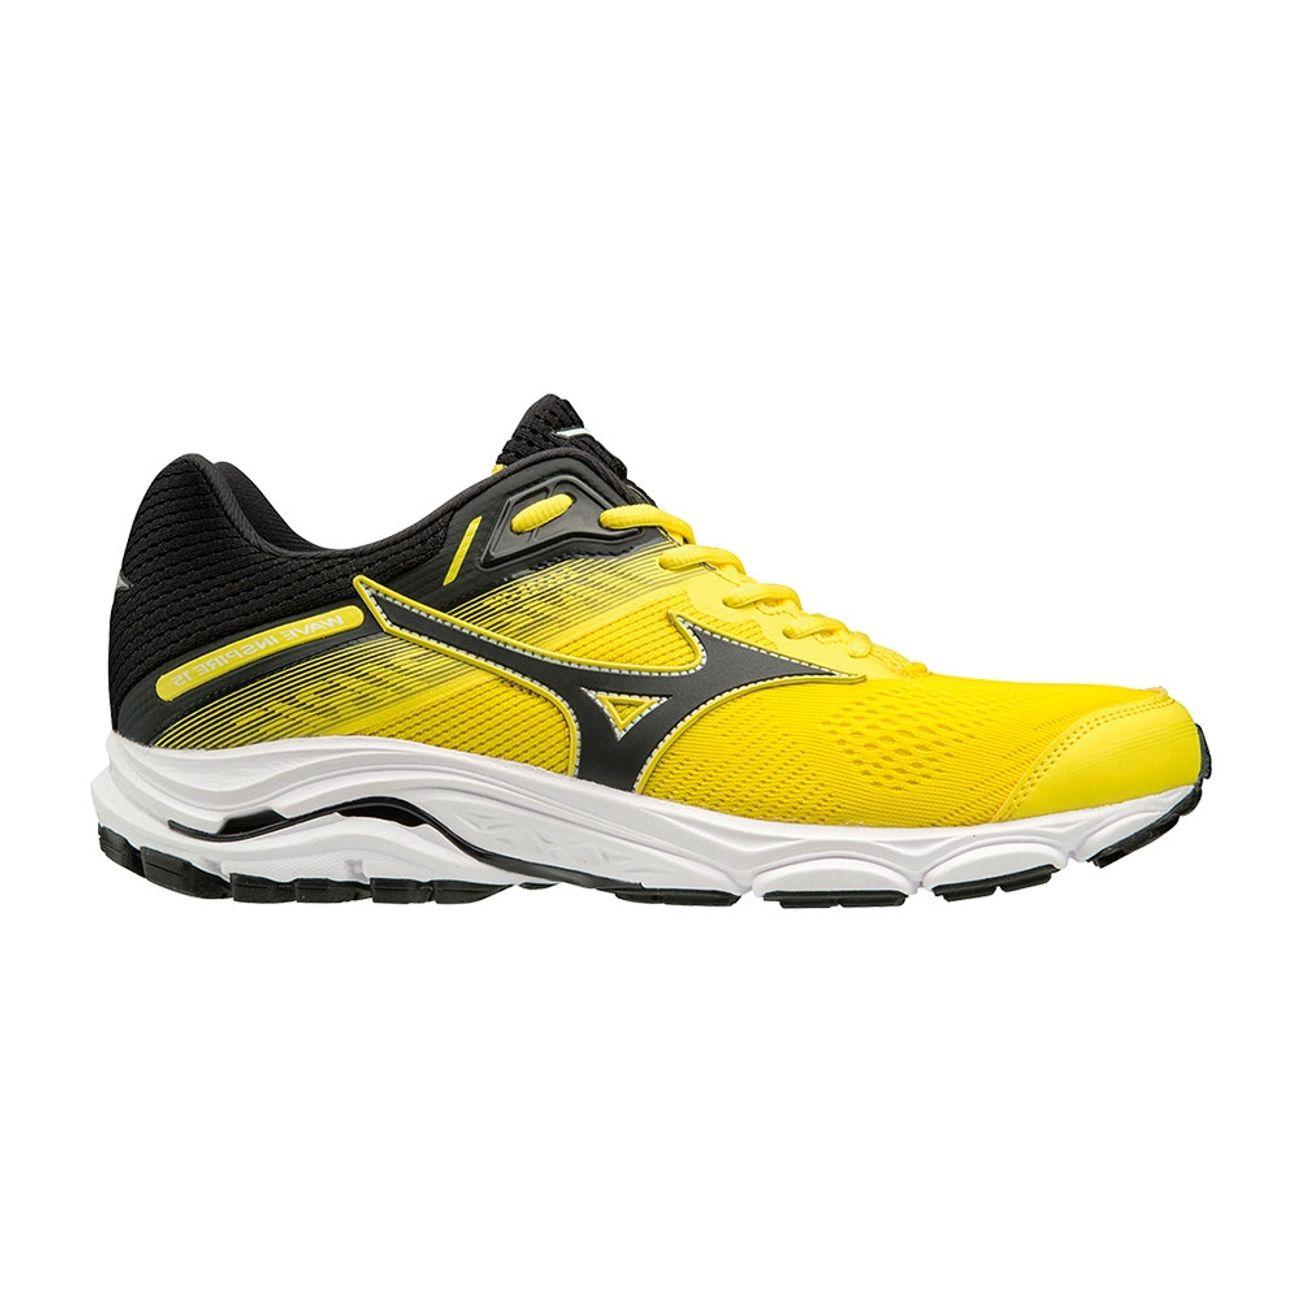 Course à pied homme MIZUNO Chaussures Mizuno Wave inspire 15